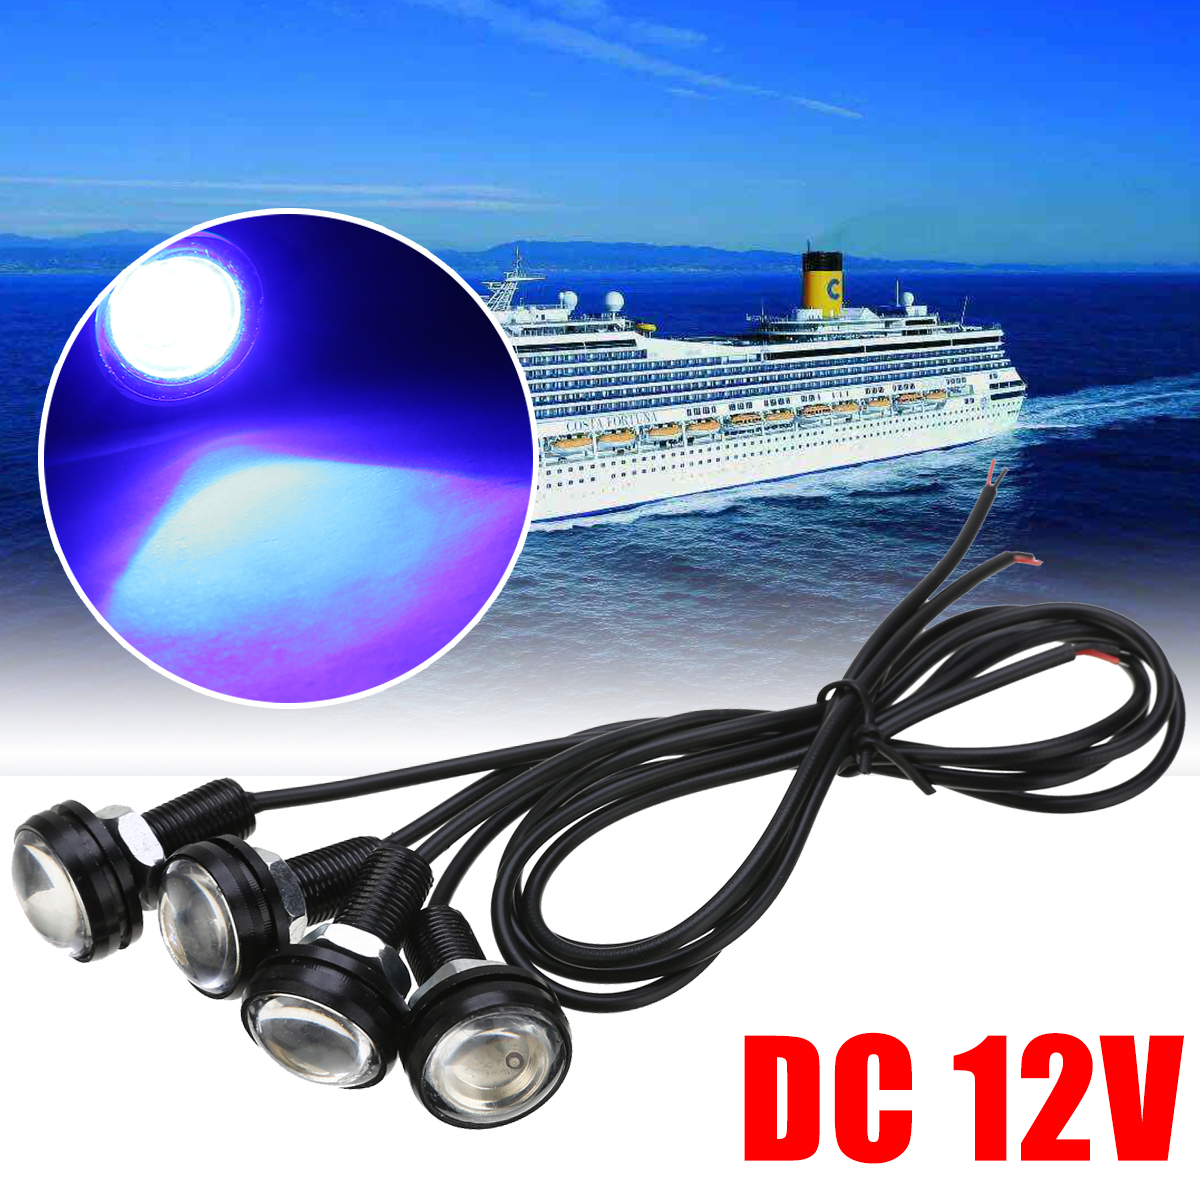 For Marine Boat Lights 4pcs 12V 3W Blue LED Boat Light Waterproof Outrigger Spreader Transom Underwater Fish Signal Lamp